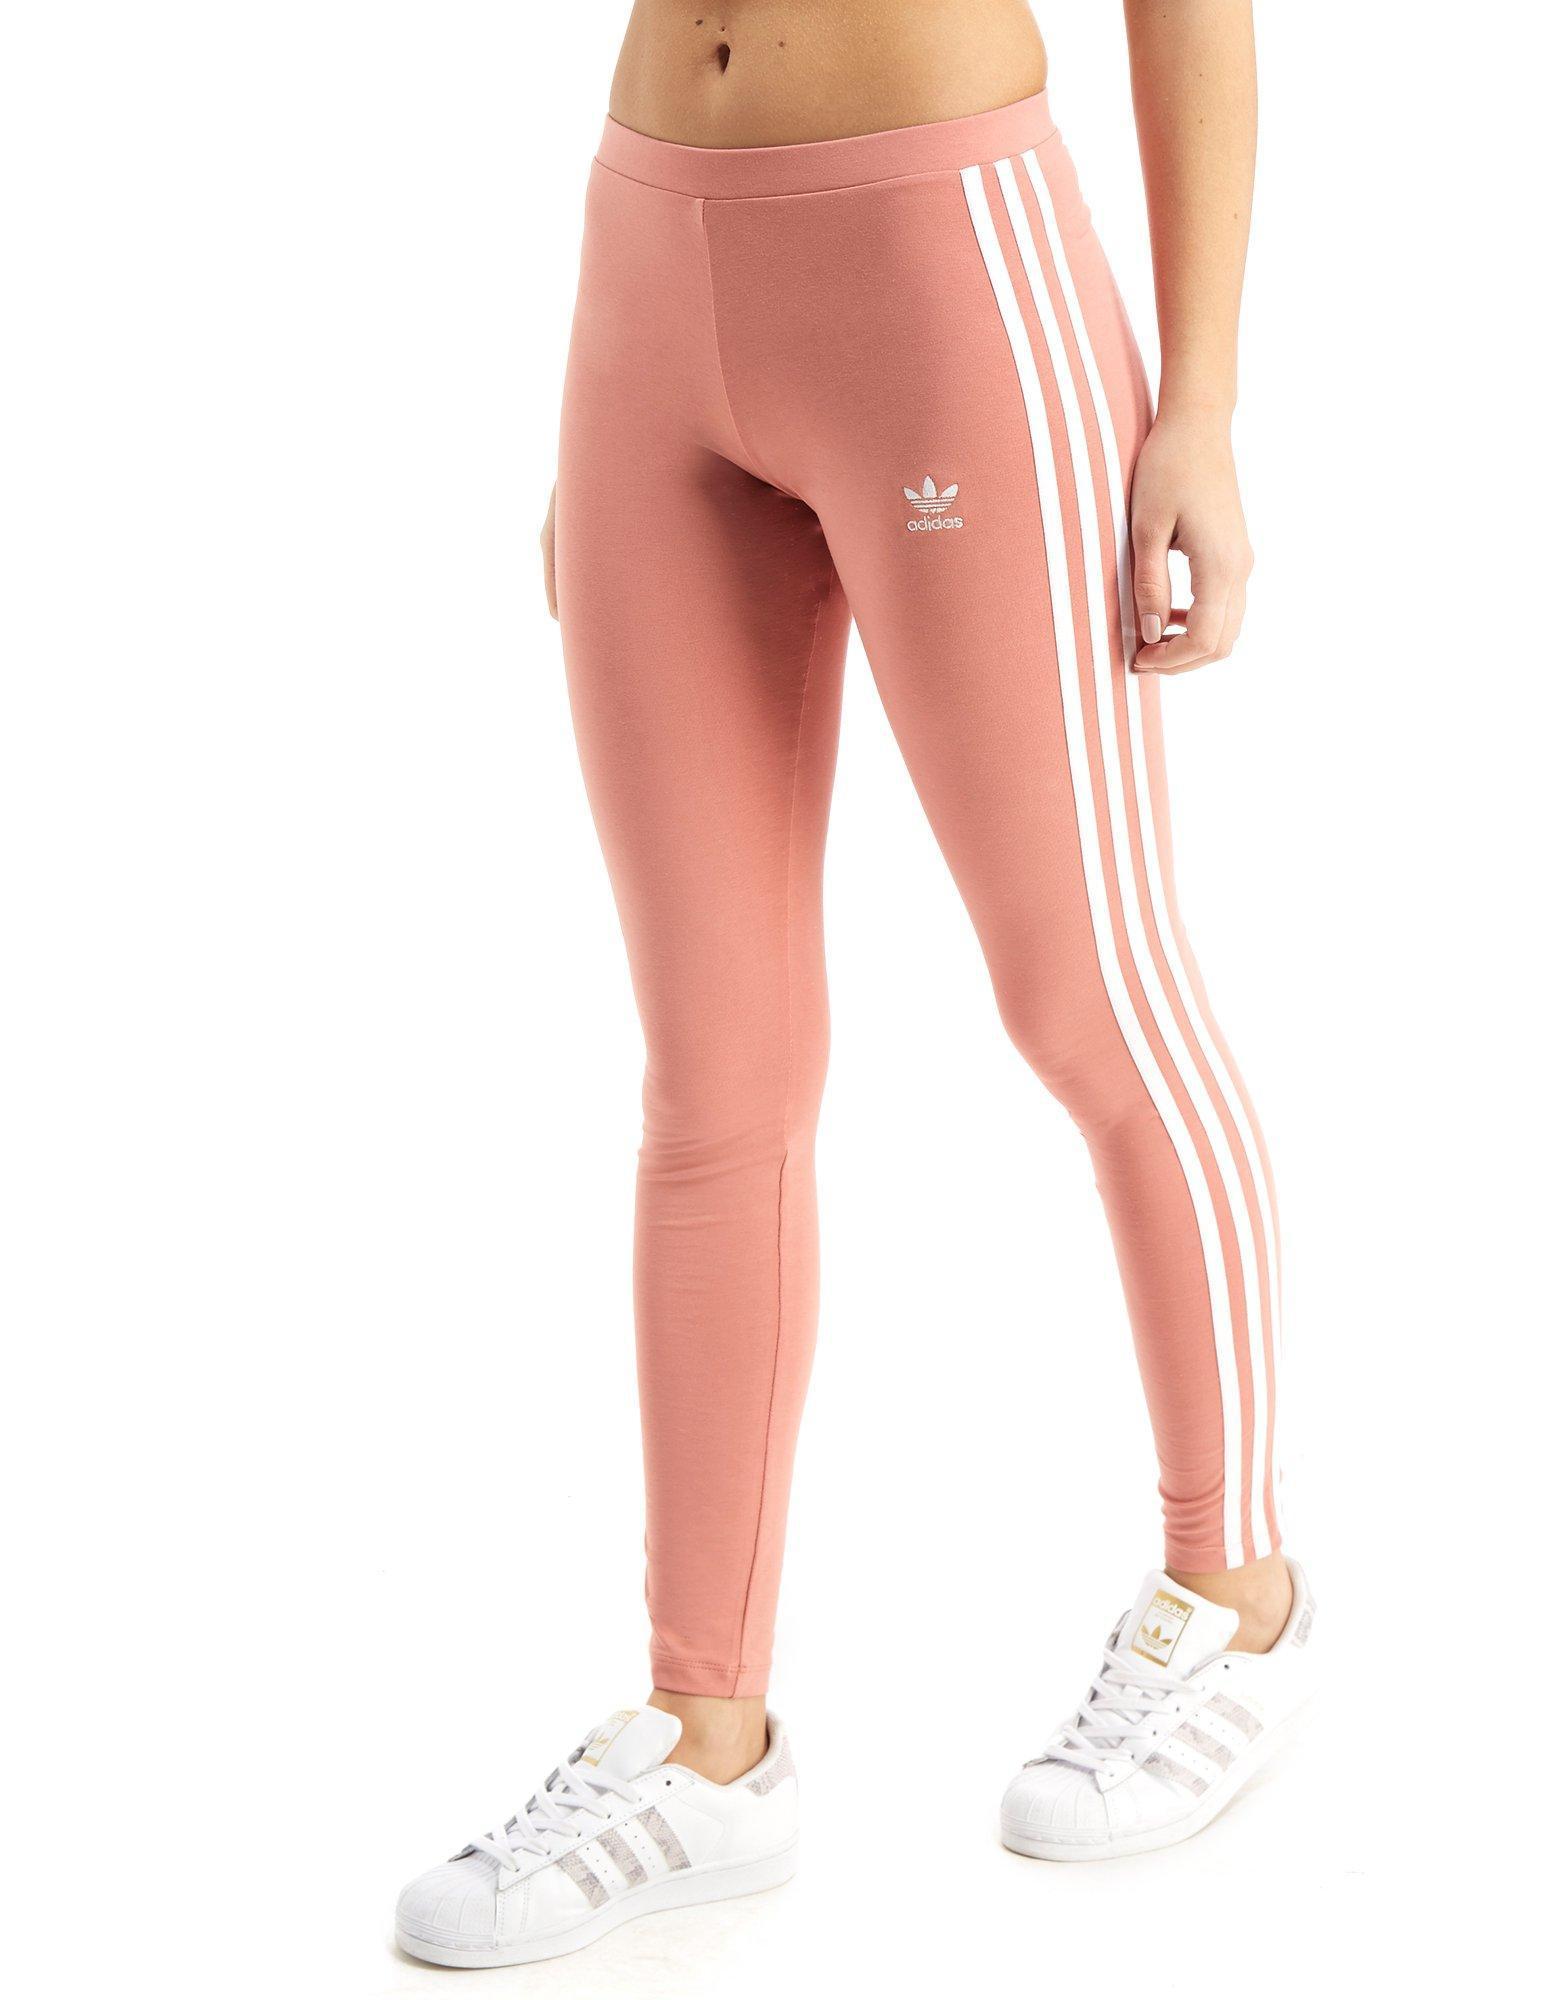 5104171bfdfa9 adidas 3-stripes Leggings in Pink - Lyst